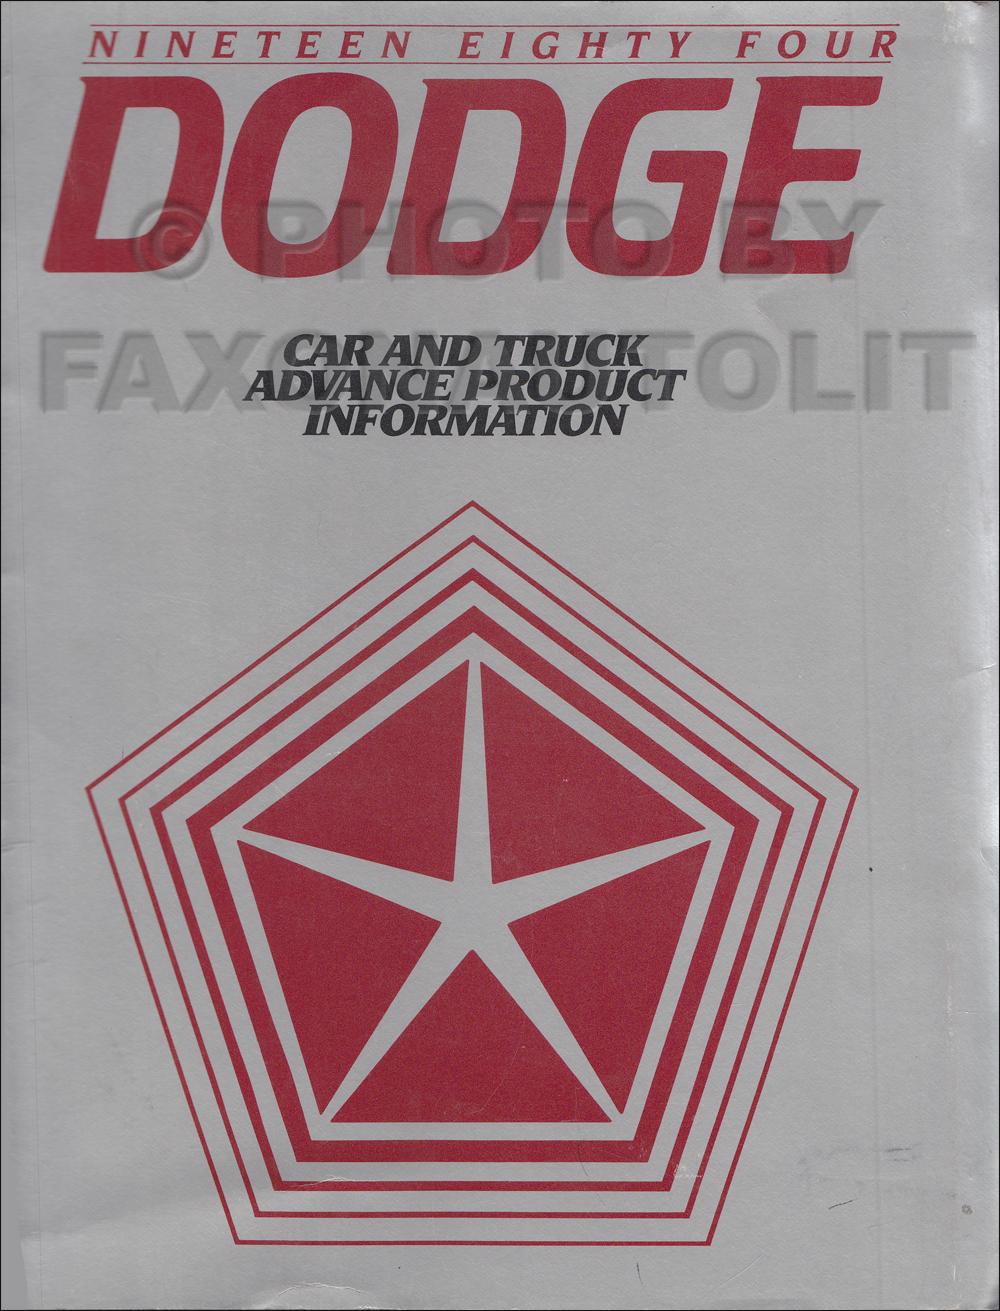 1984 Dodge Advance Product Information Original Dealer Album